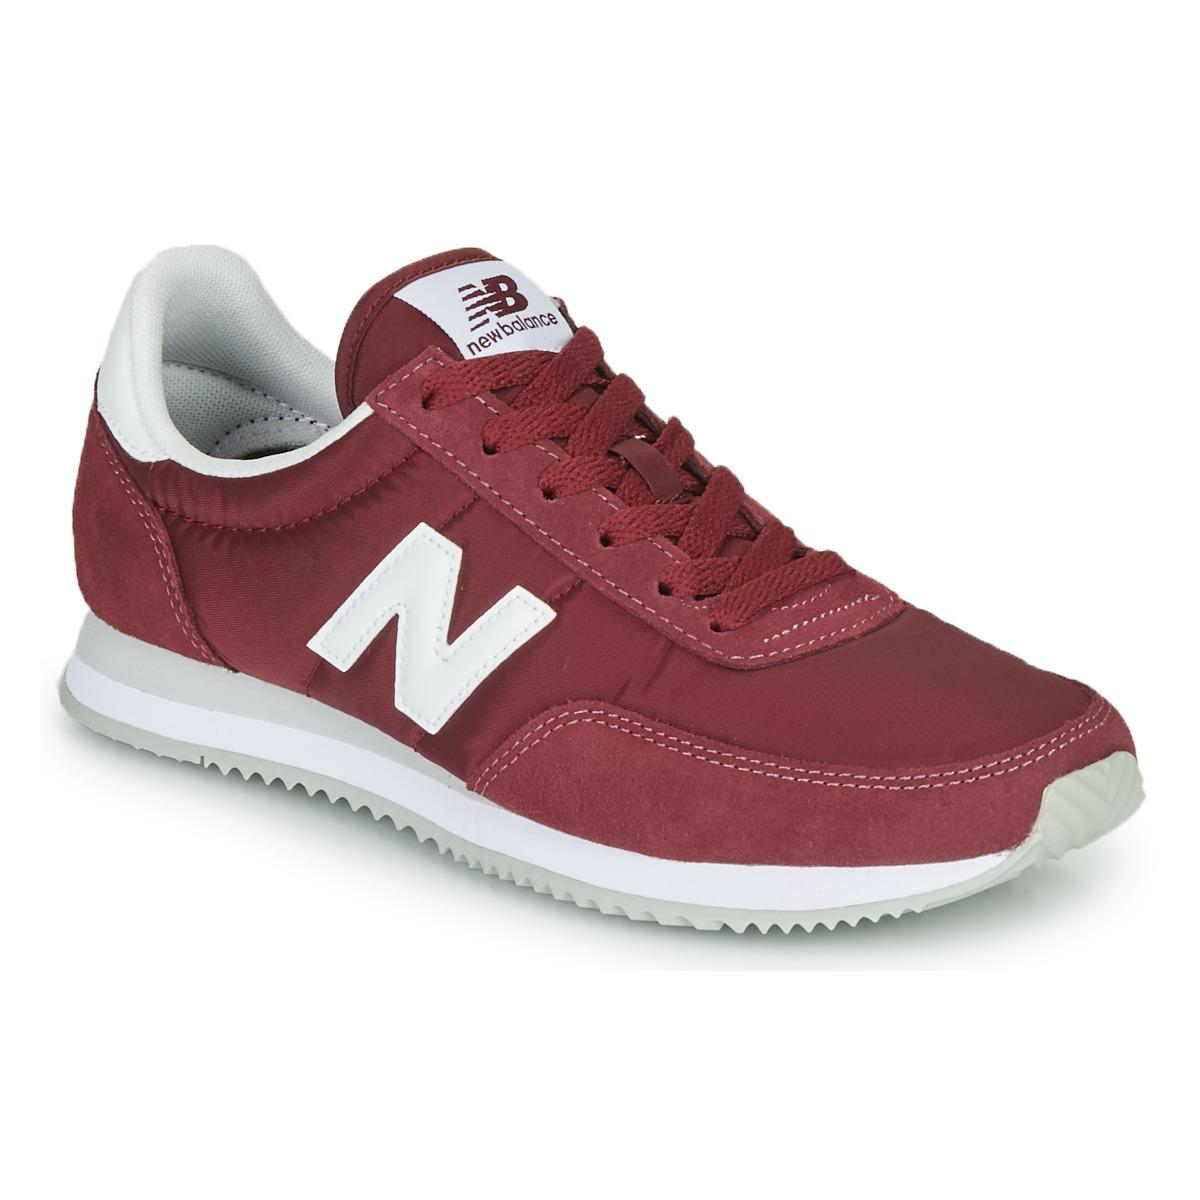 Sneakers uomo New Balance 720 Bordeaux